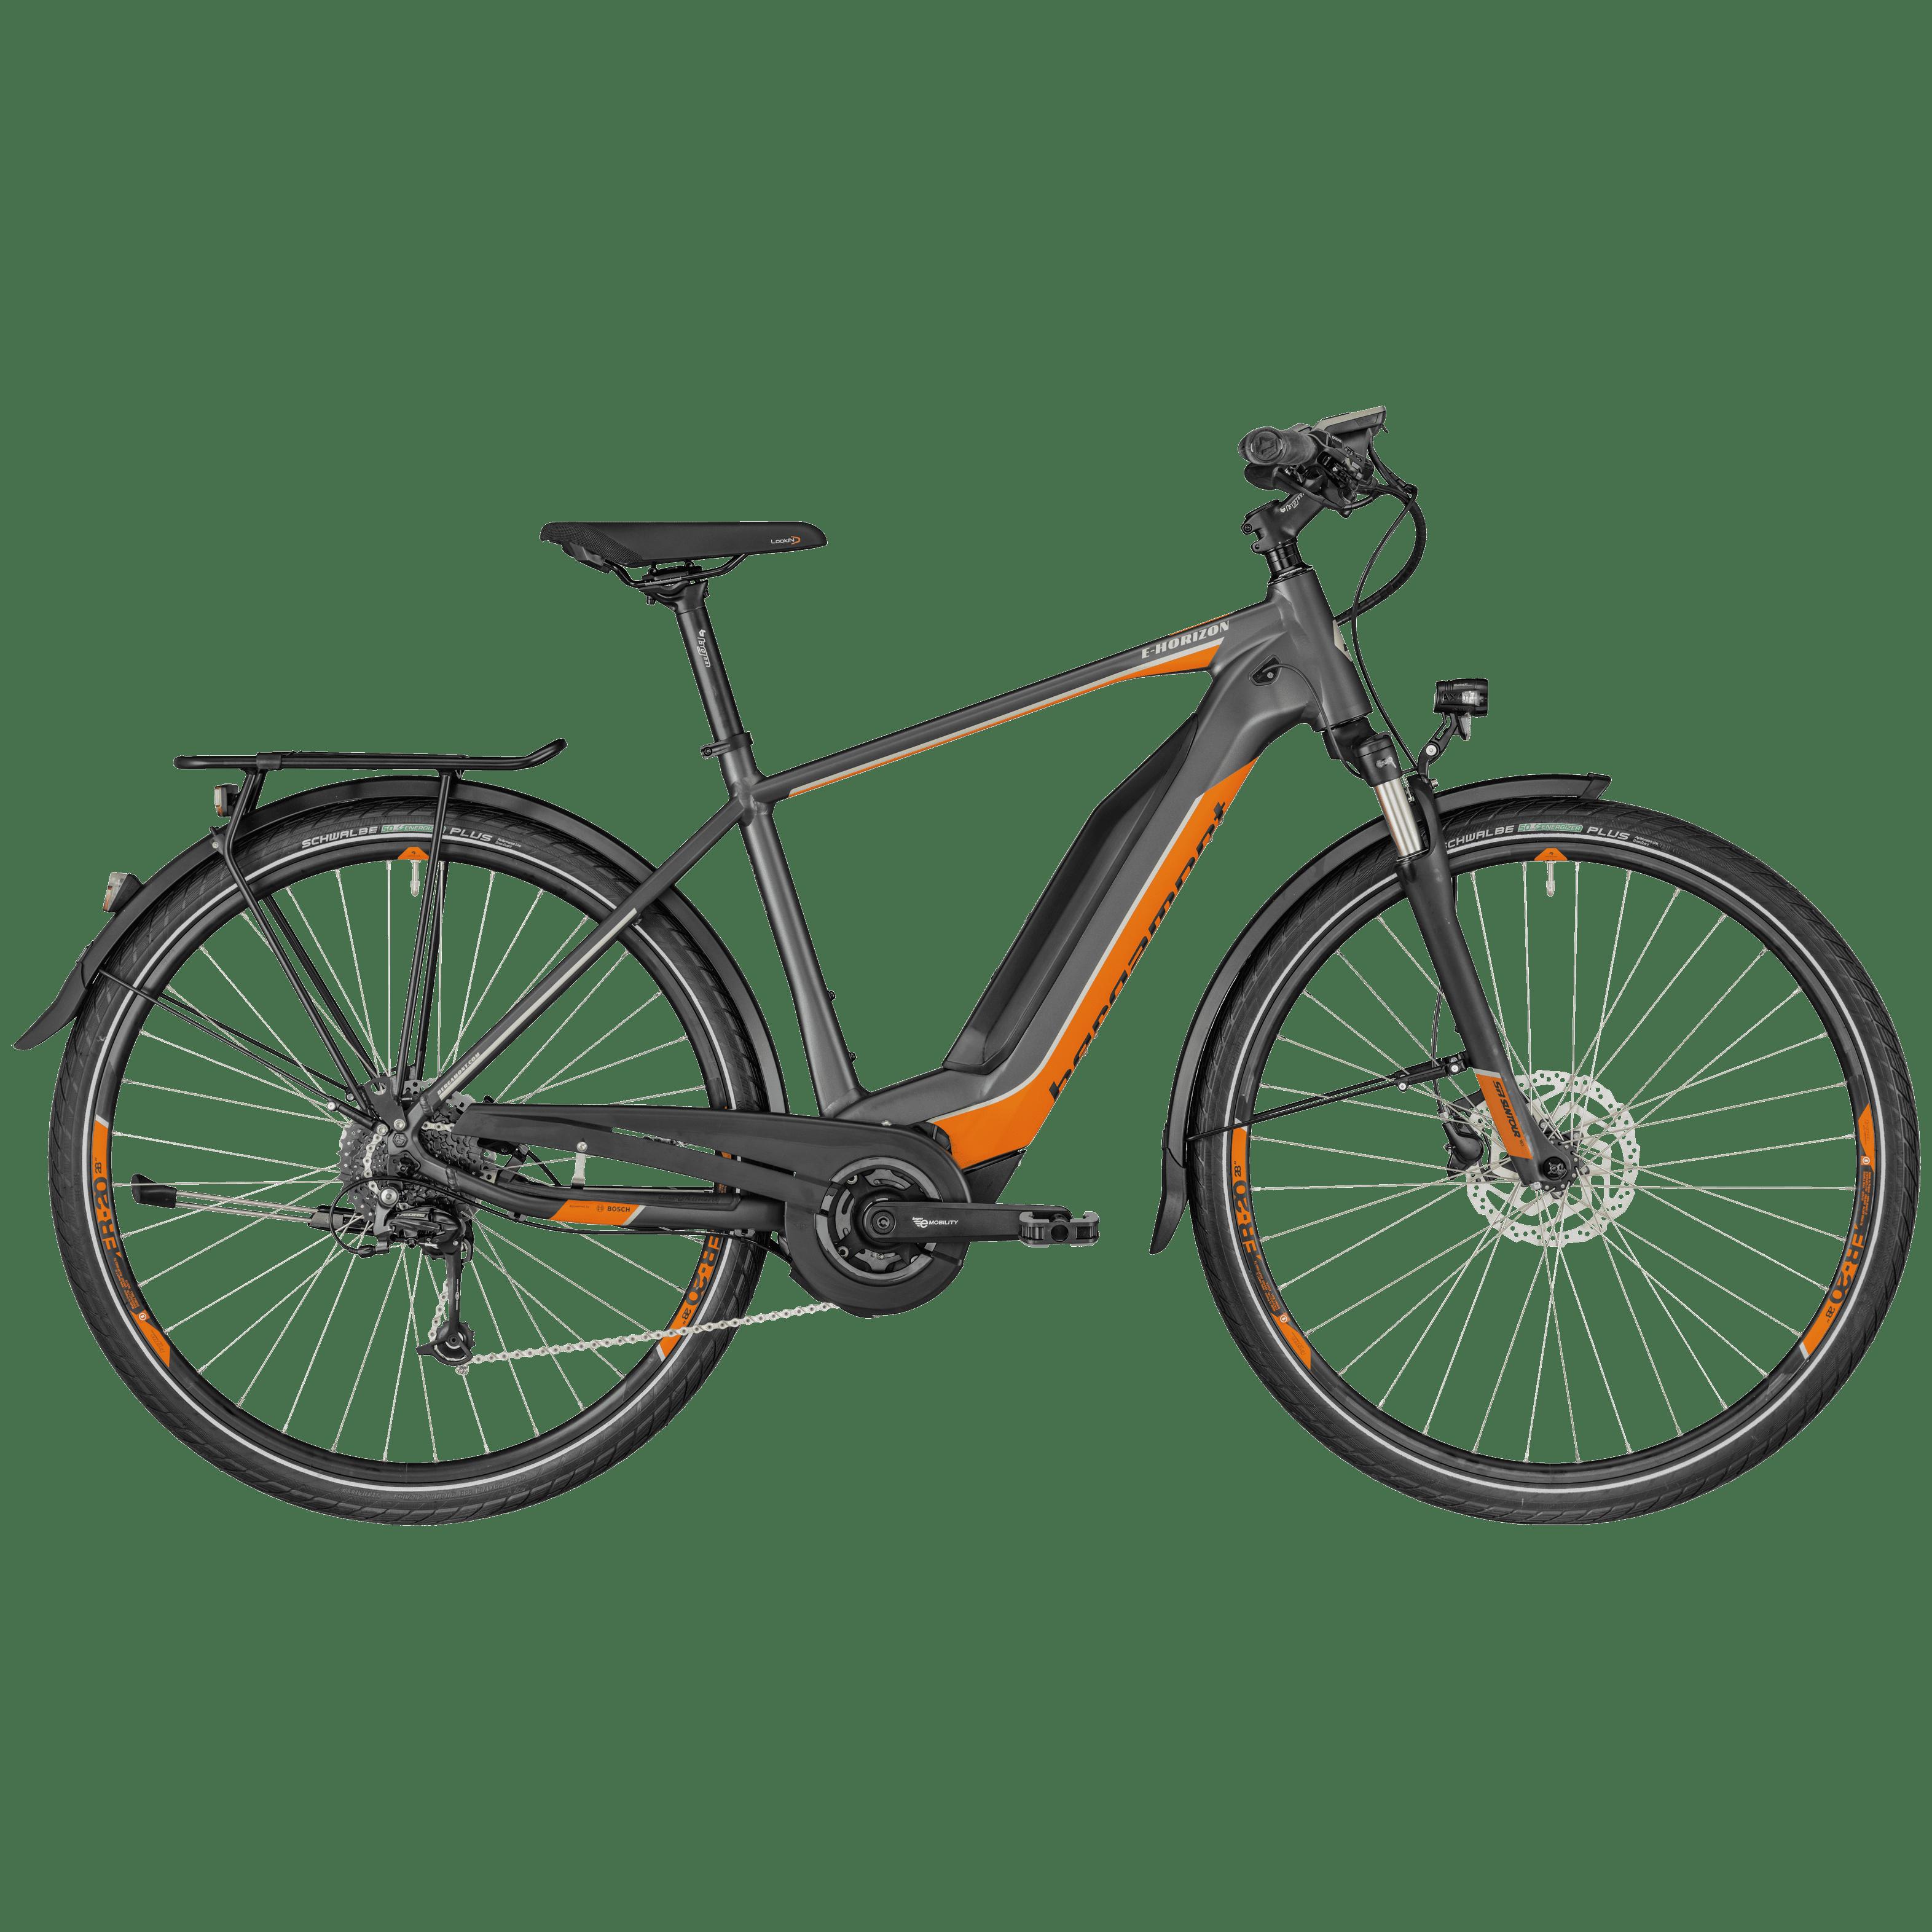 2019 focus jam2 6 7 plus e bike shop and hire keswick. Black Bedroom Furniture Sets. Home Design Ideas